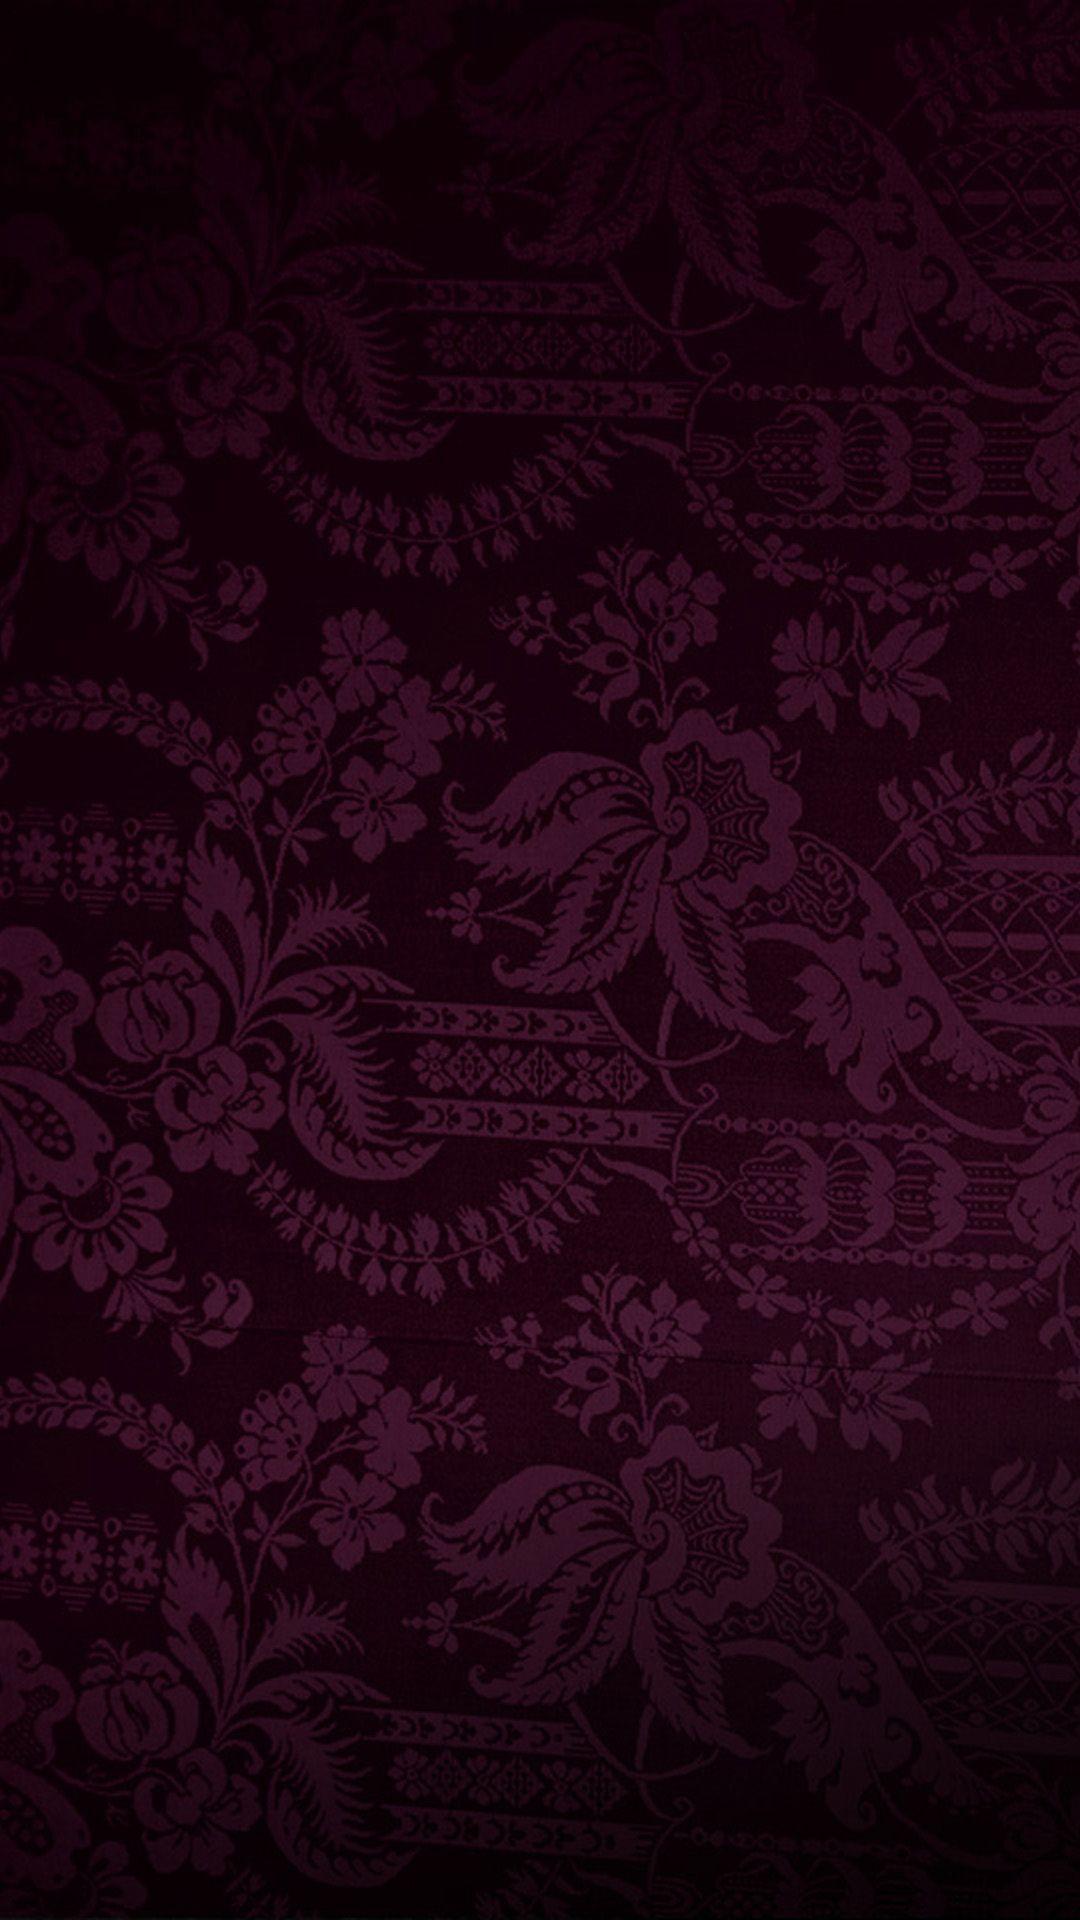 Most Inspiring Wallpaper Marble Burgundy - 3bbb5c4508ff1a9c63362c58cf539133  HD_279512.jpg